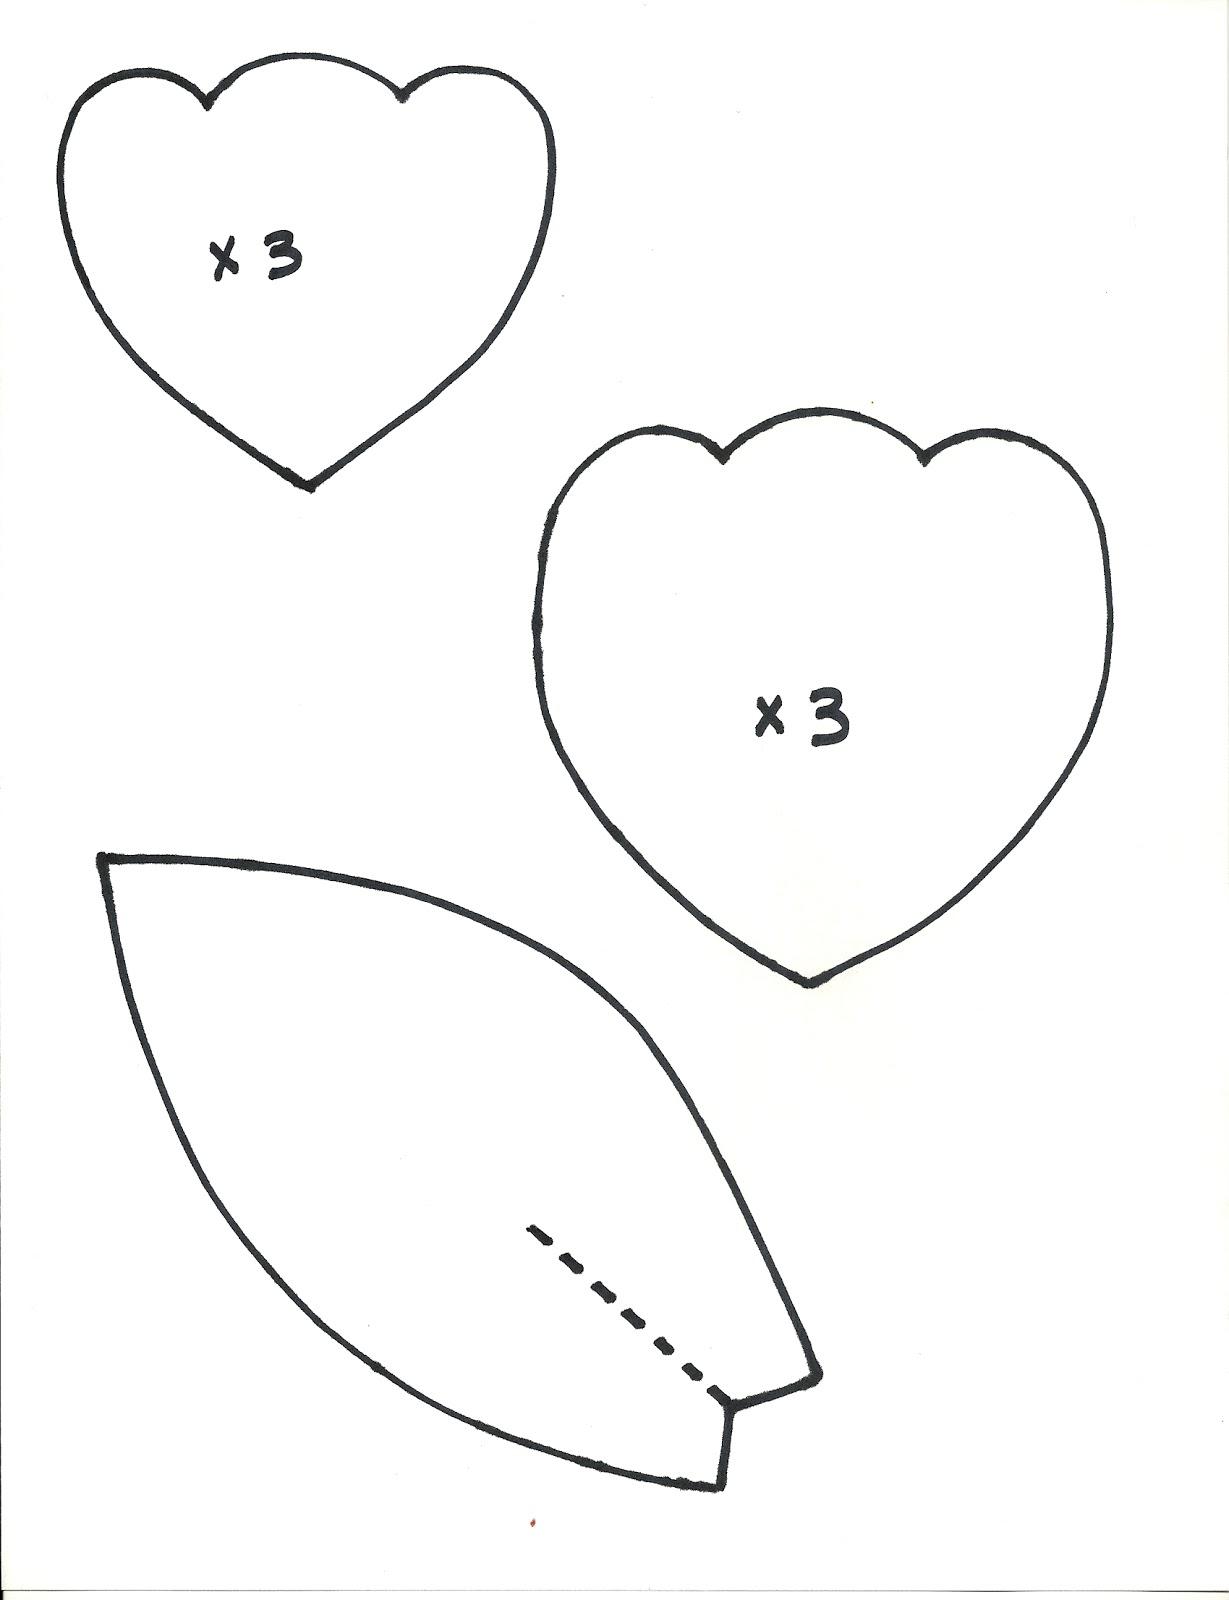 Flower Leaf Template Printable 6 best images of flower leaf template ...